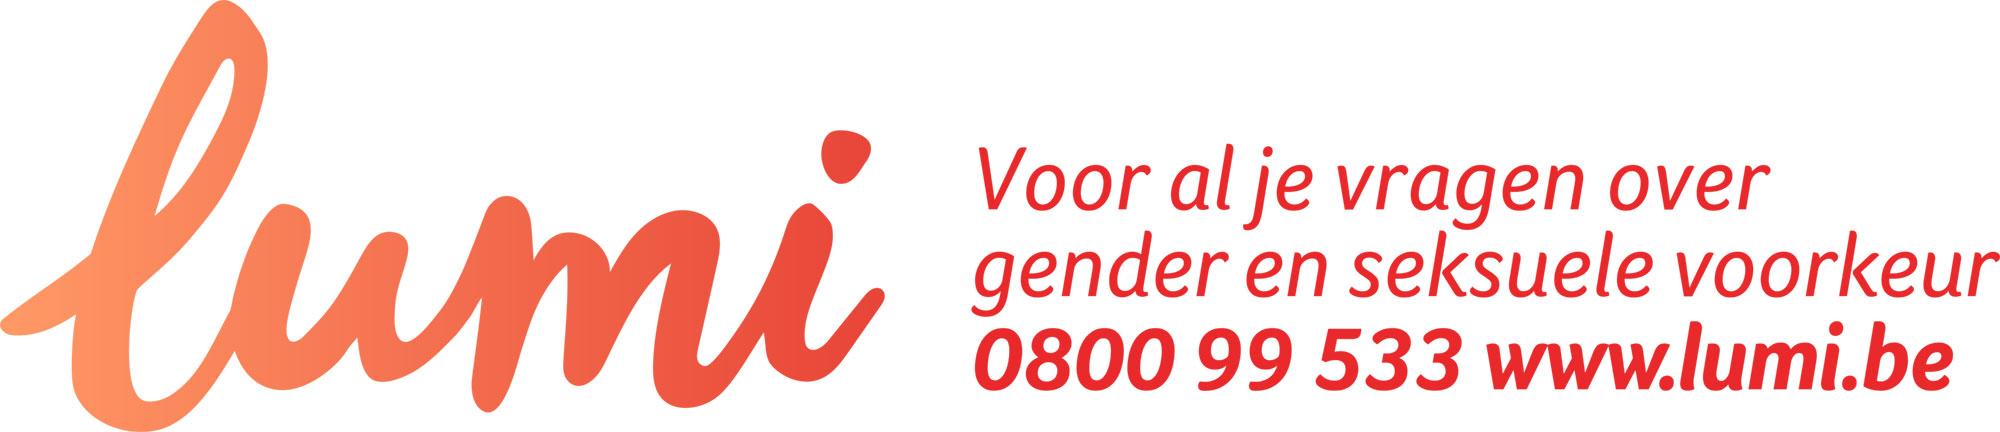 Logo https://www.lumi.be/